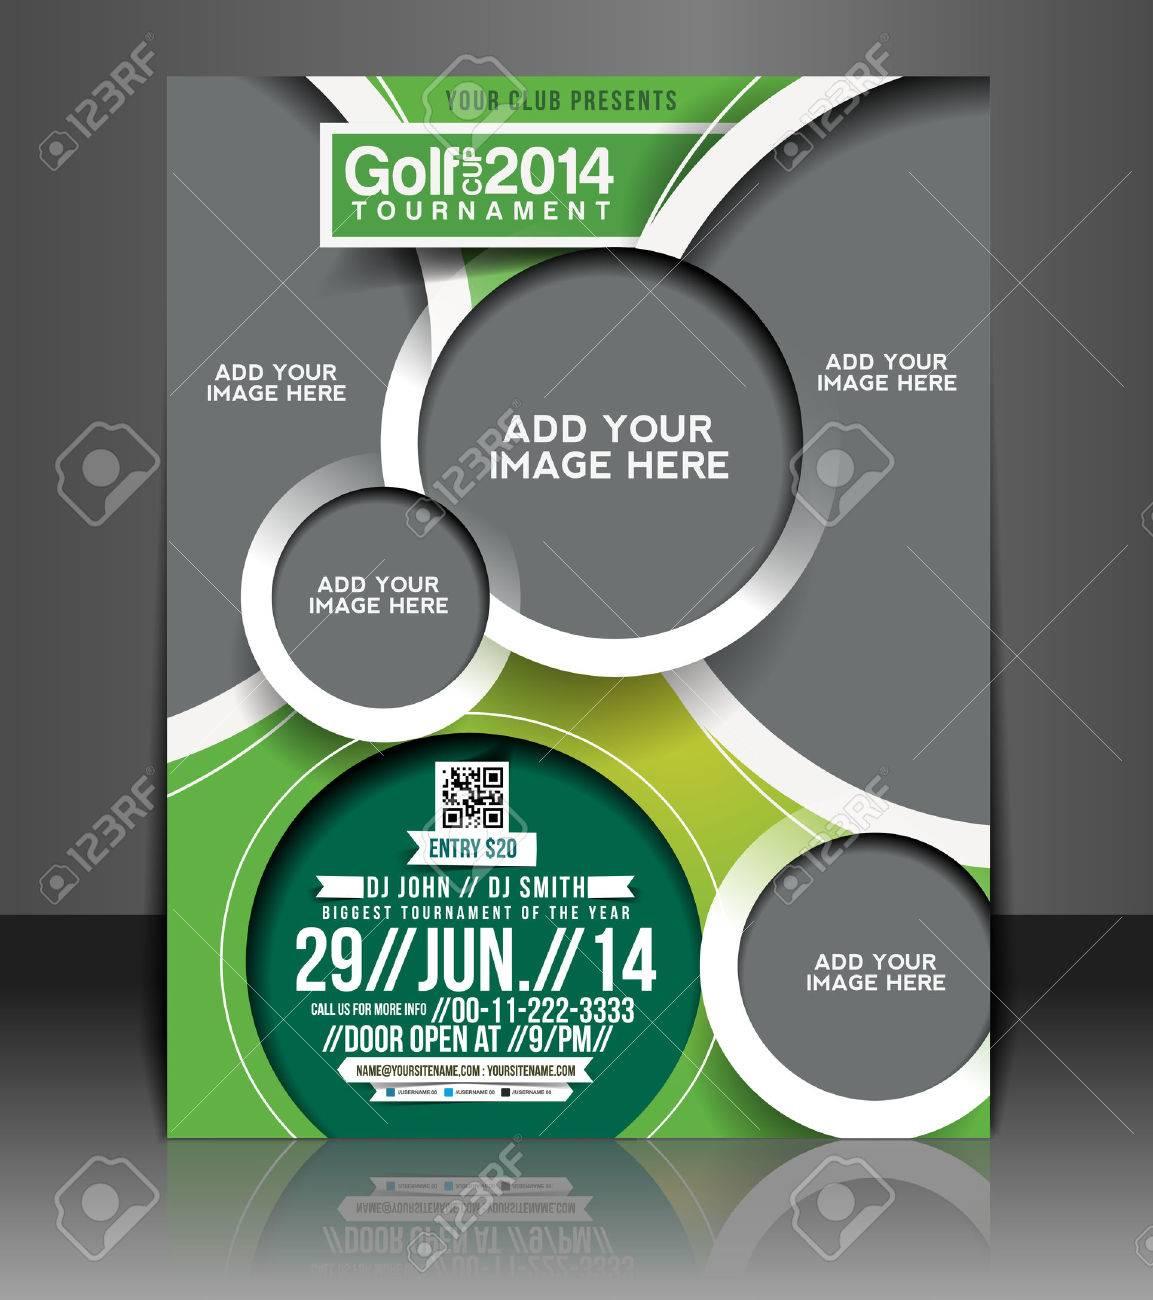 Golf Tournament Flyer & Poster Template Design Stock Vector - 26704168